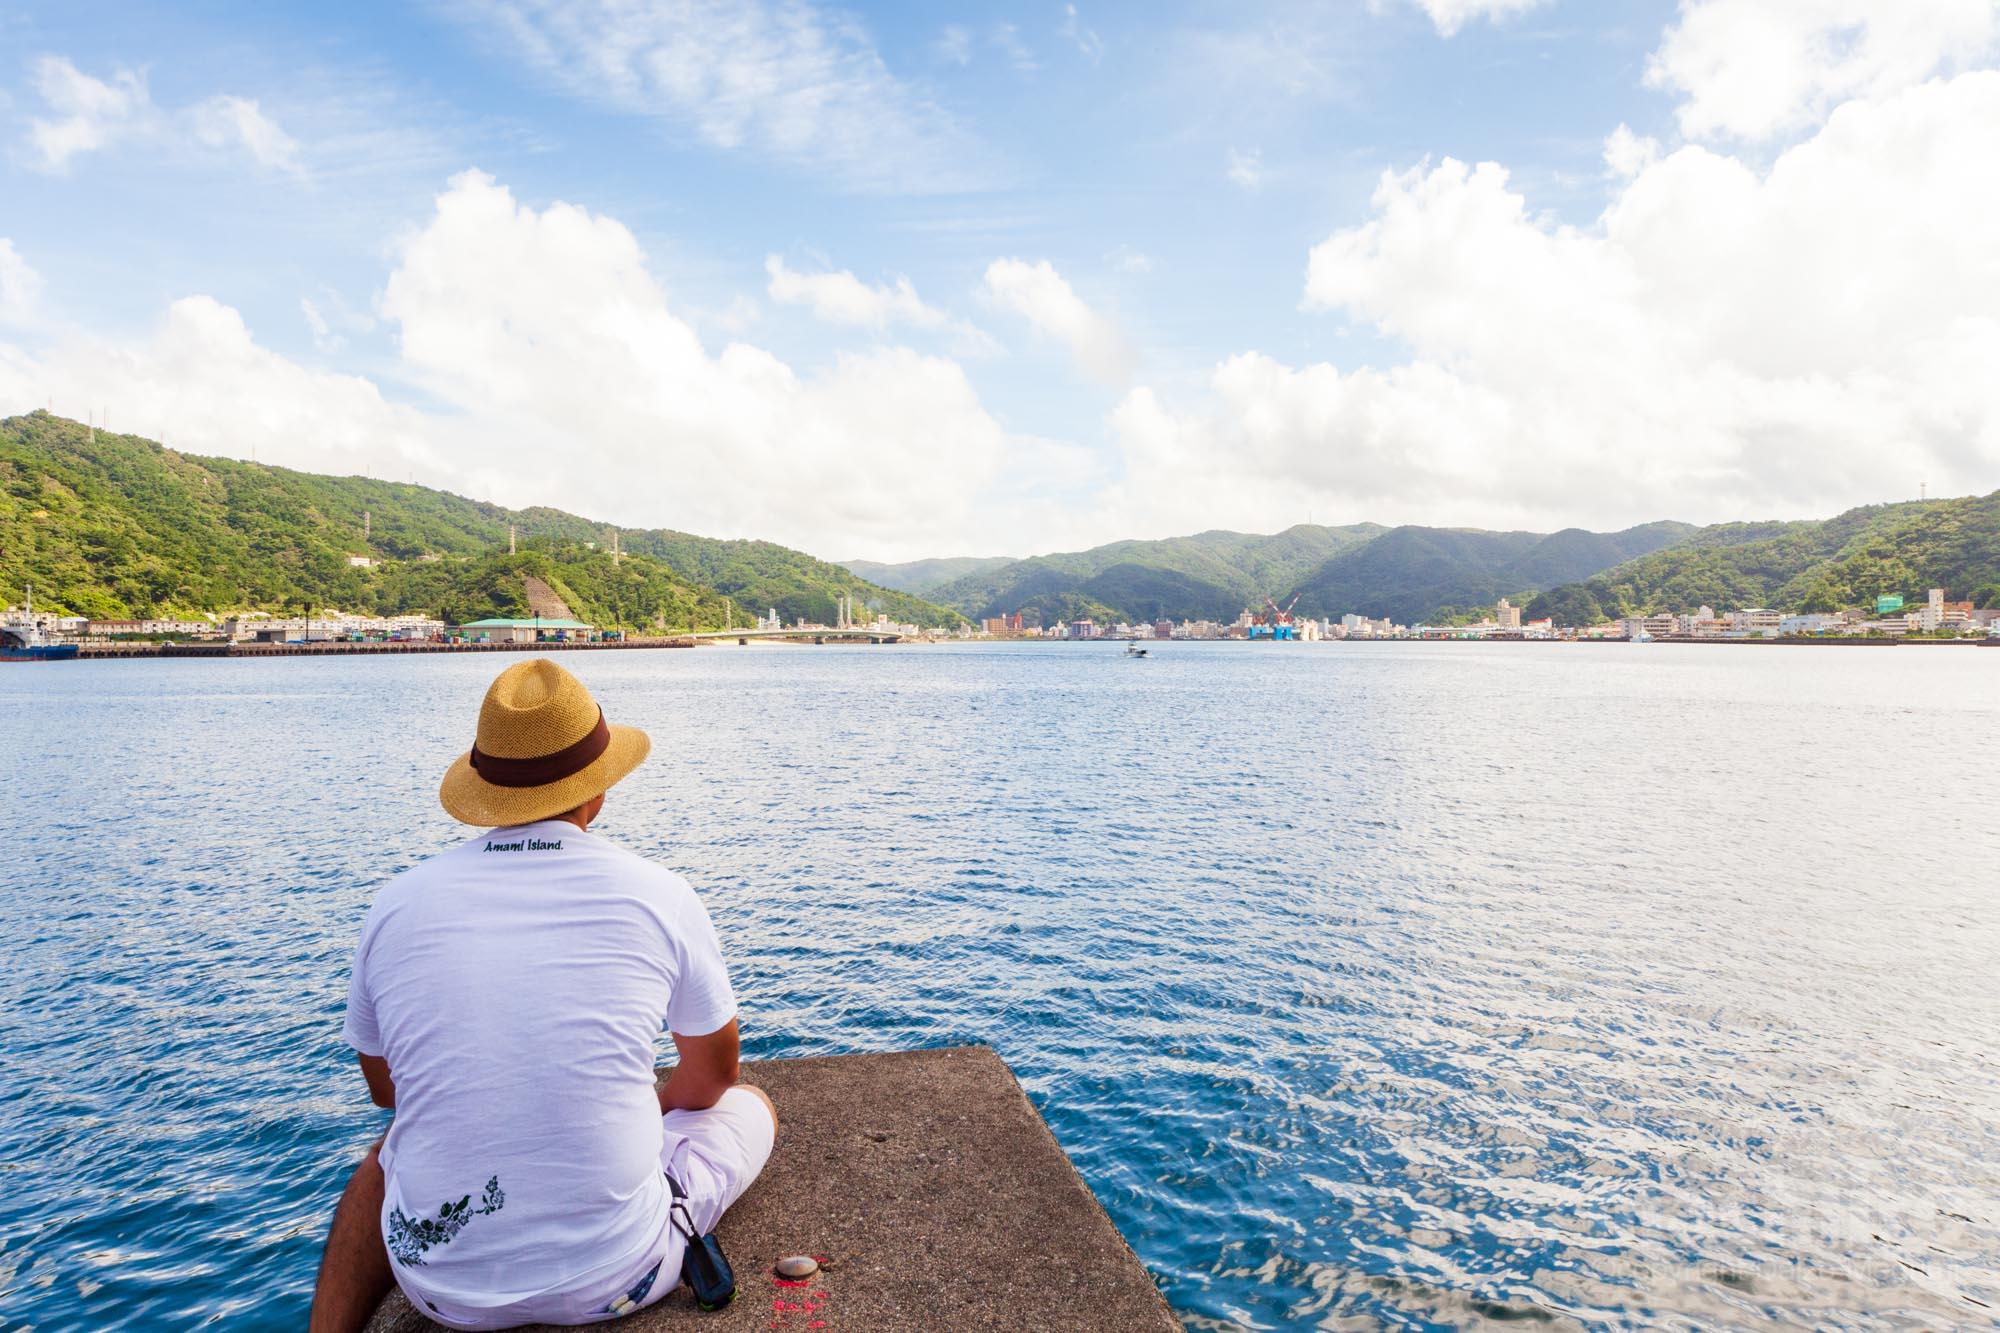 奄美探訪 旧山羊島ホテル Machiiro 記事写真 4